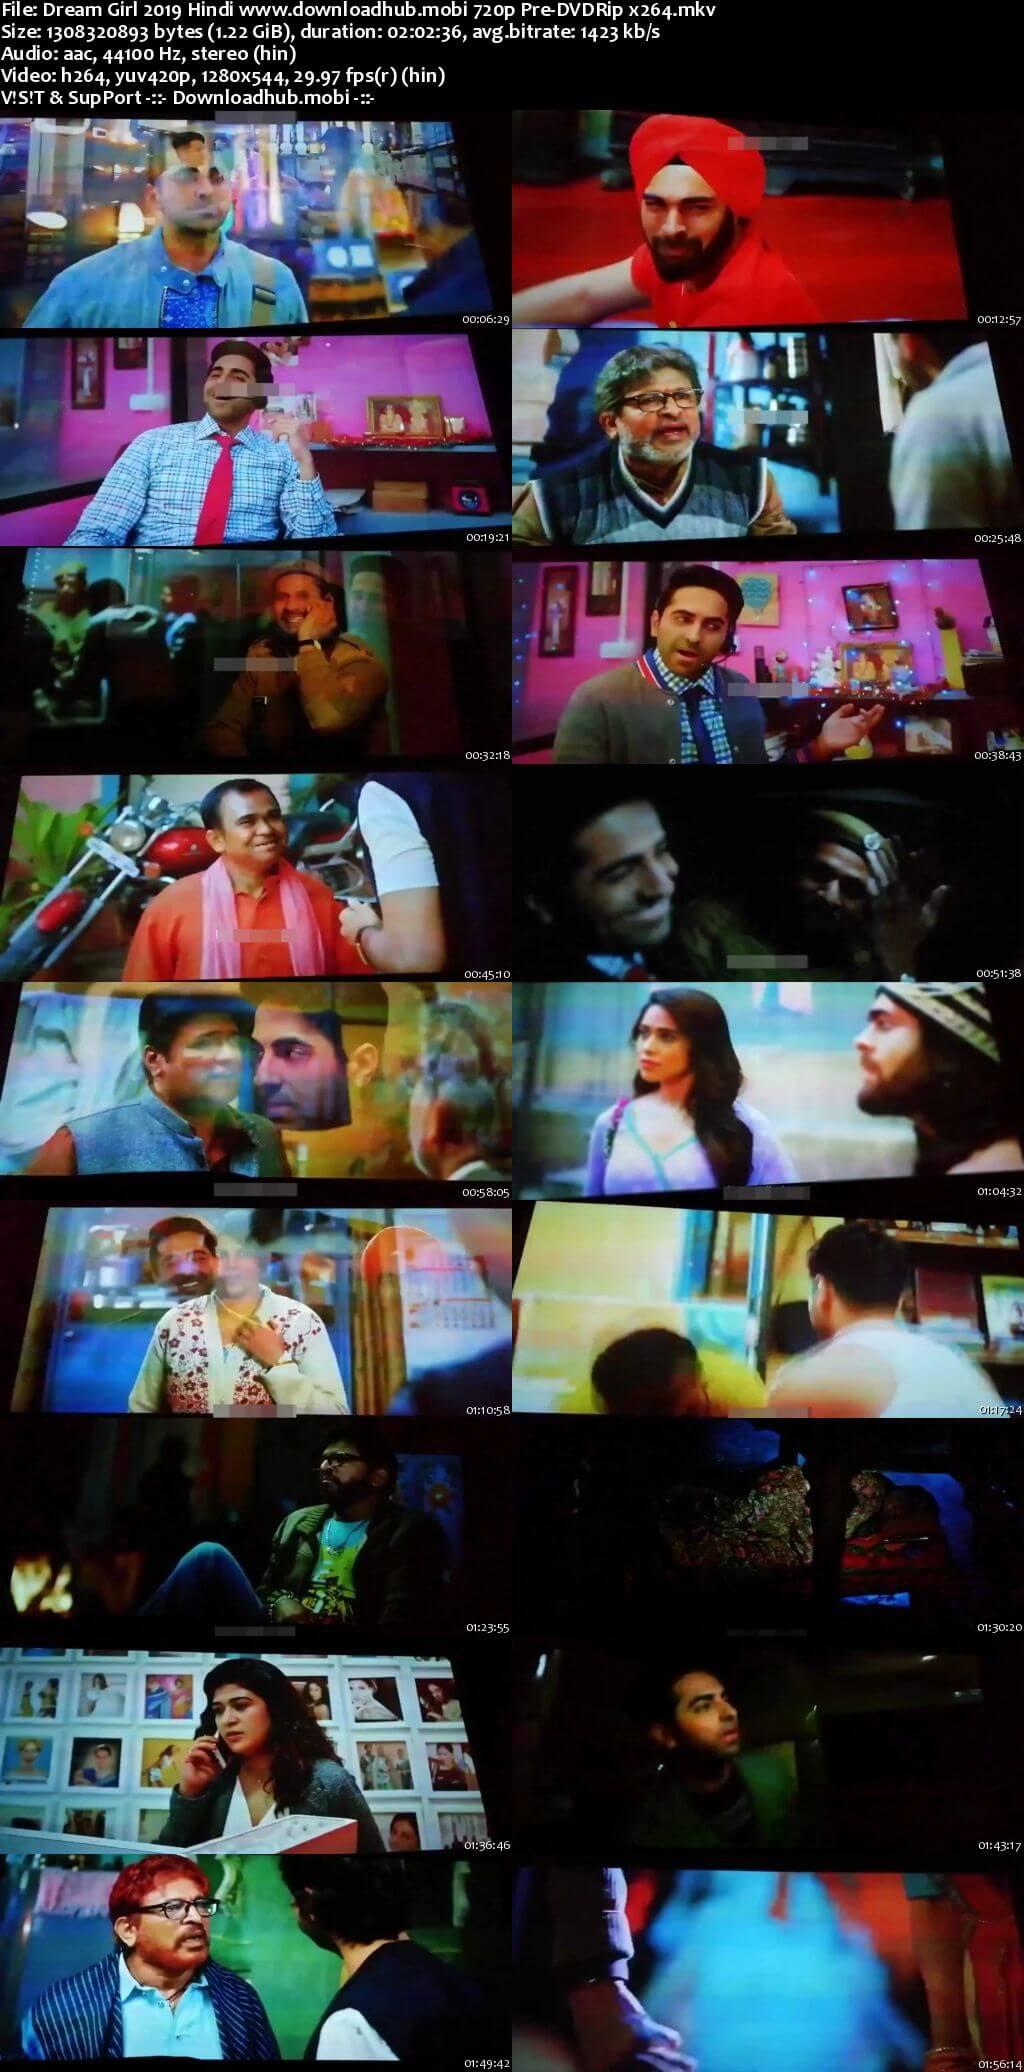 Dream Girl 2019 Hindi 720p Pre-DVDRip x264